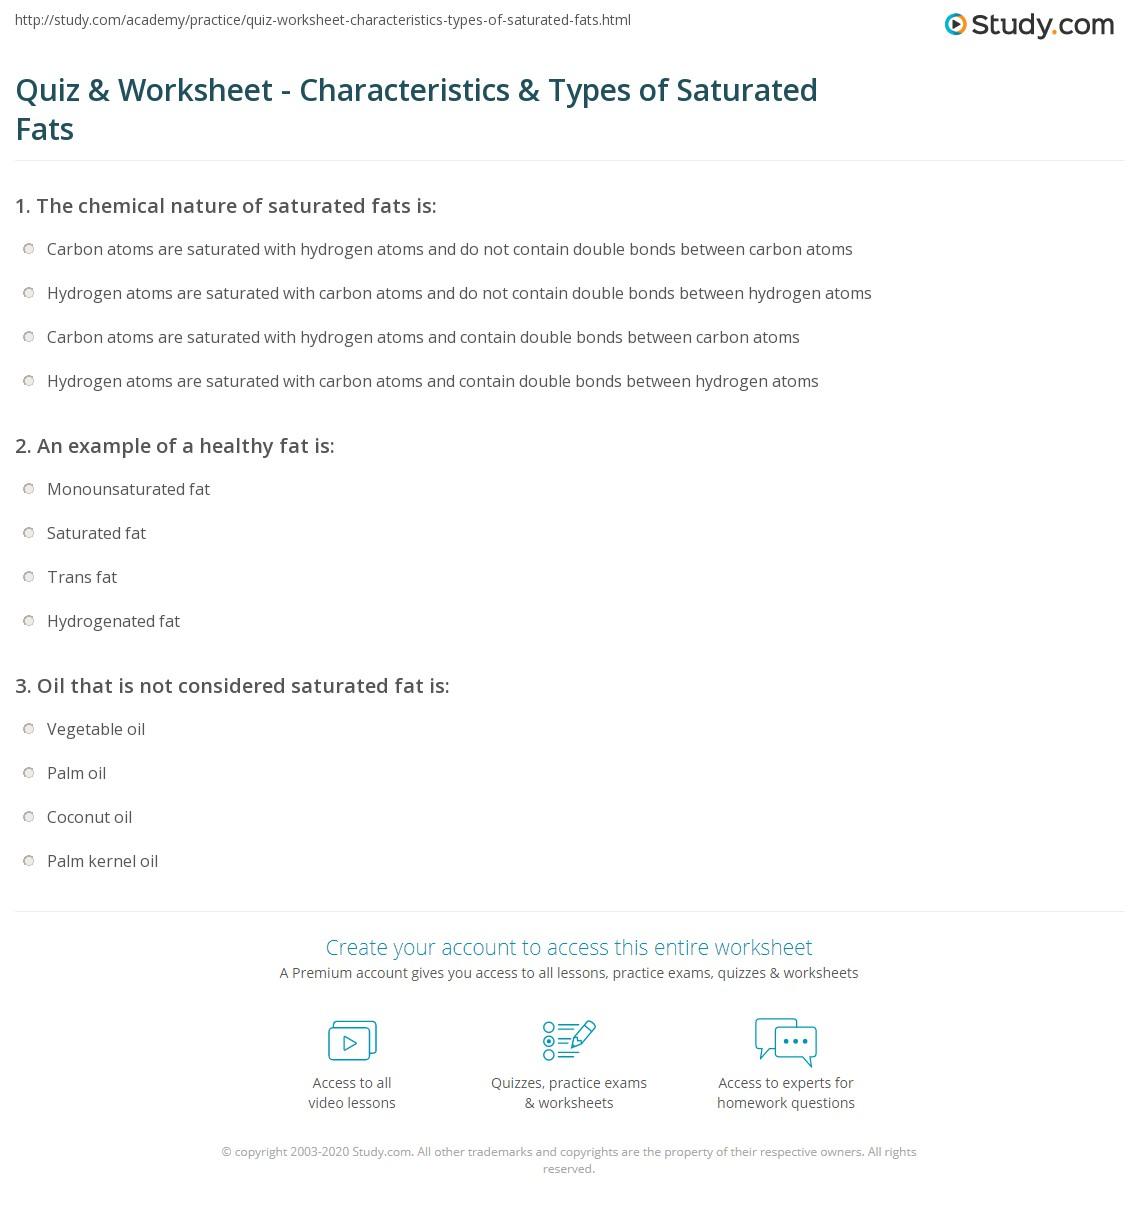 Quiz Worksheet Characteristics Types Of Saturated Fats Study